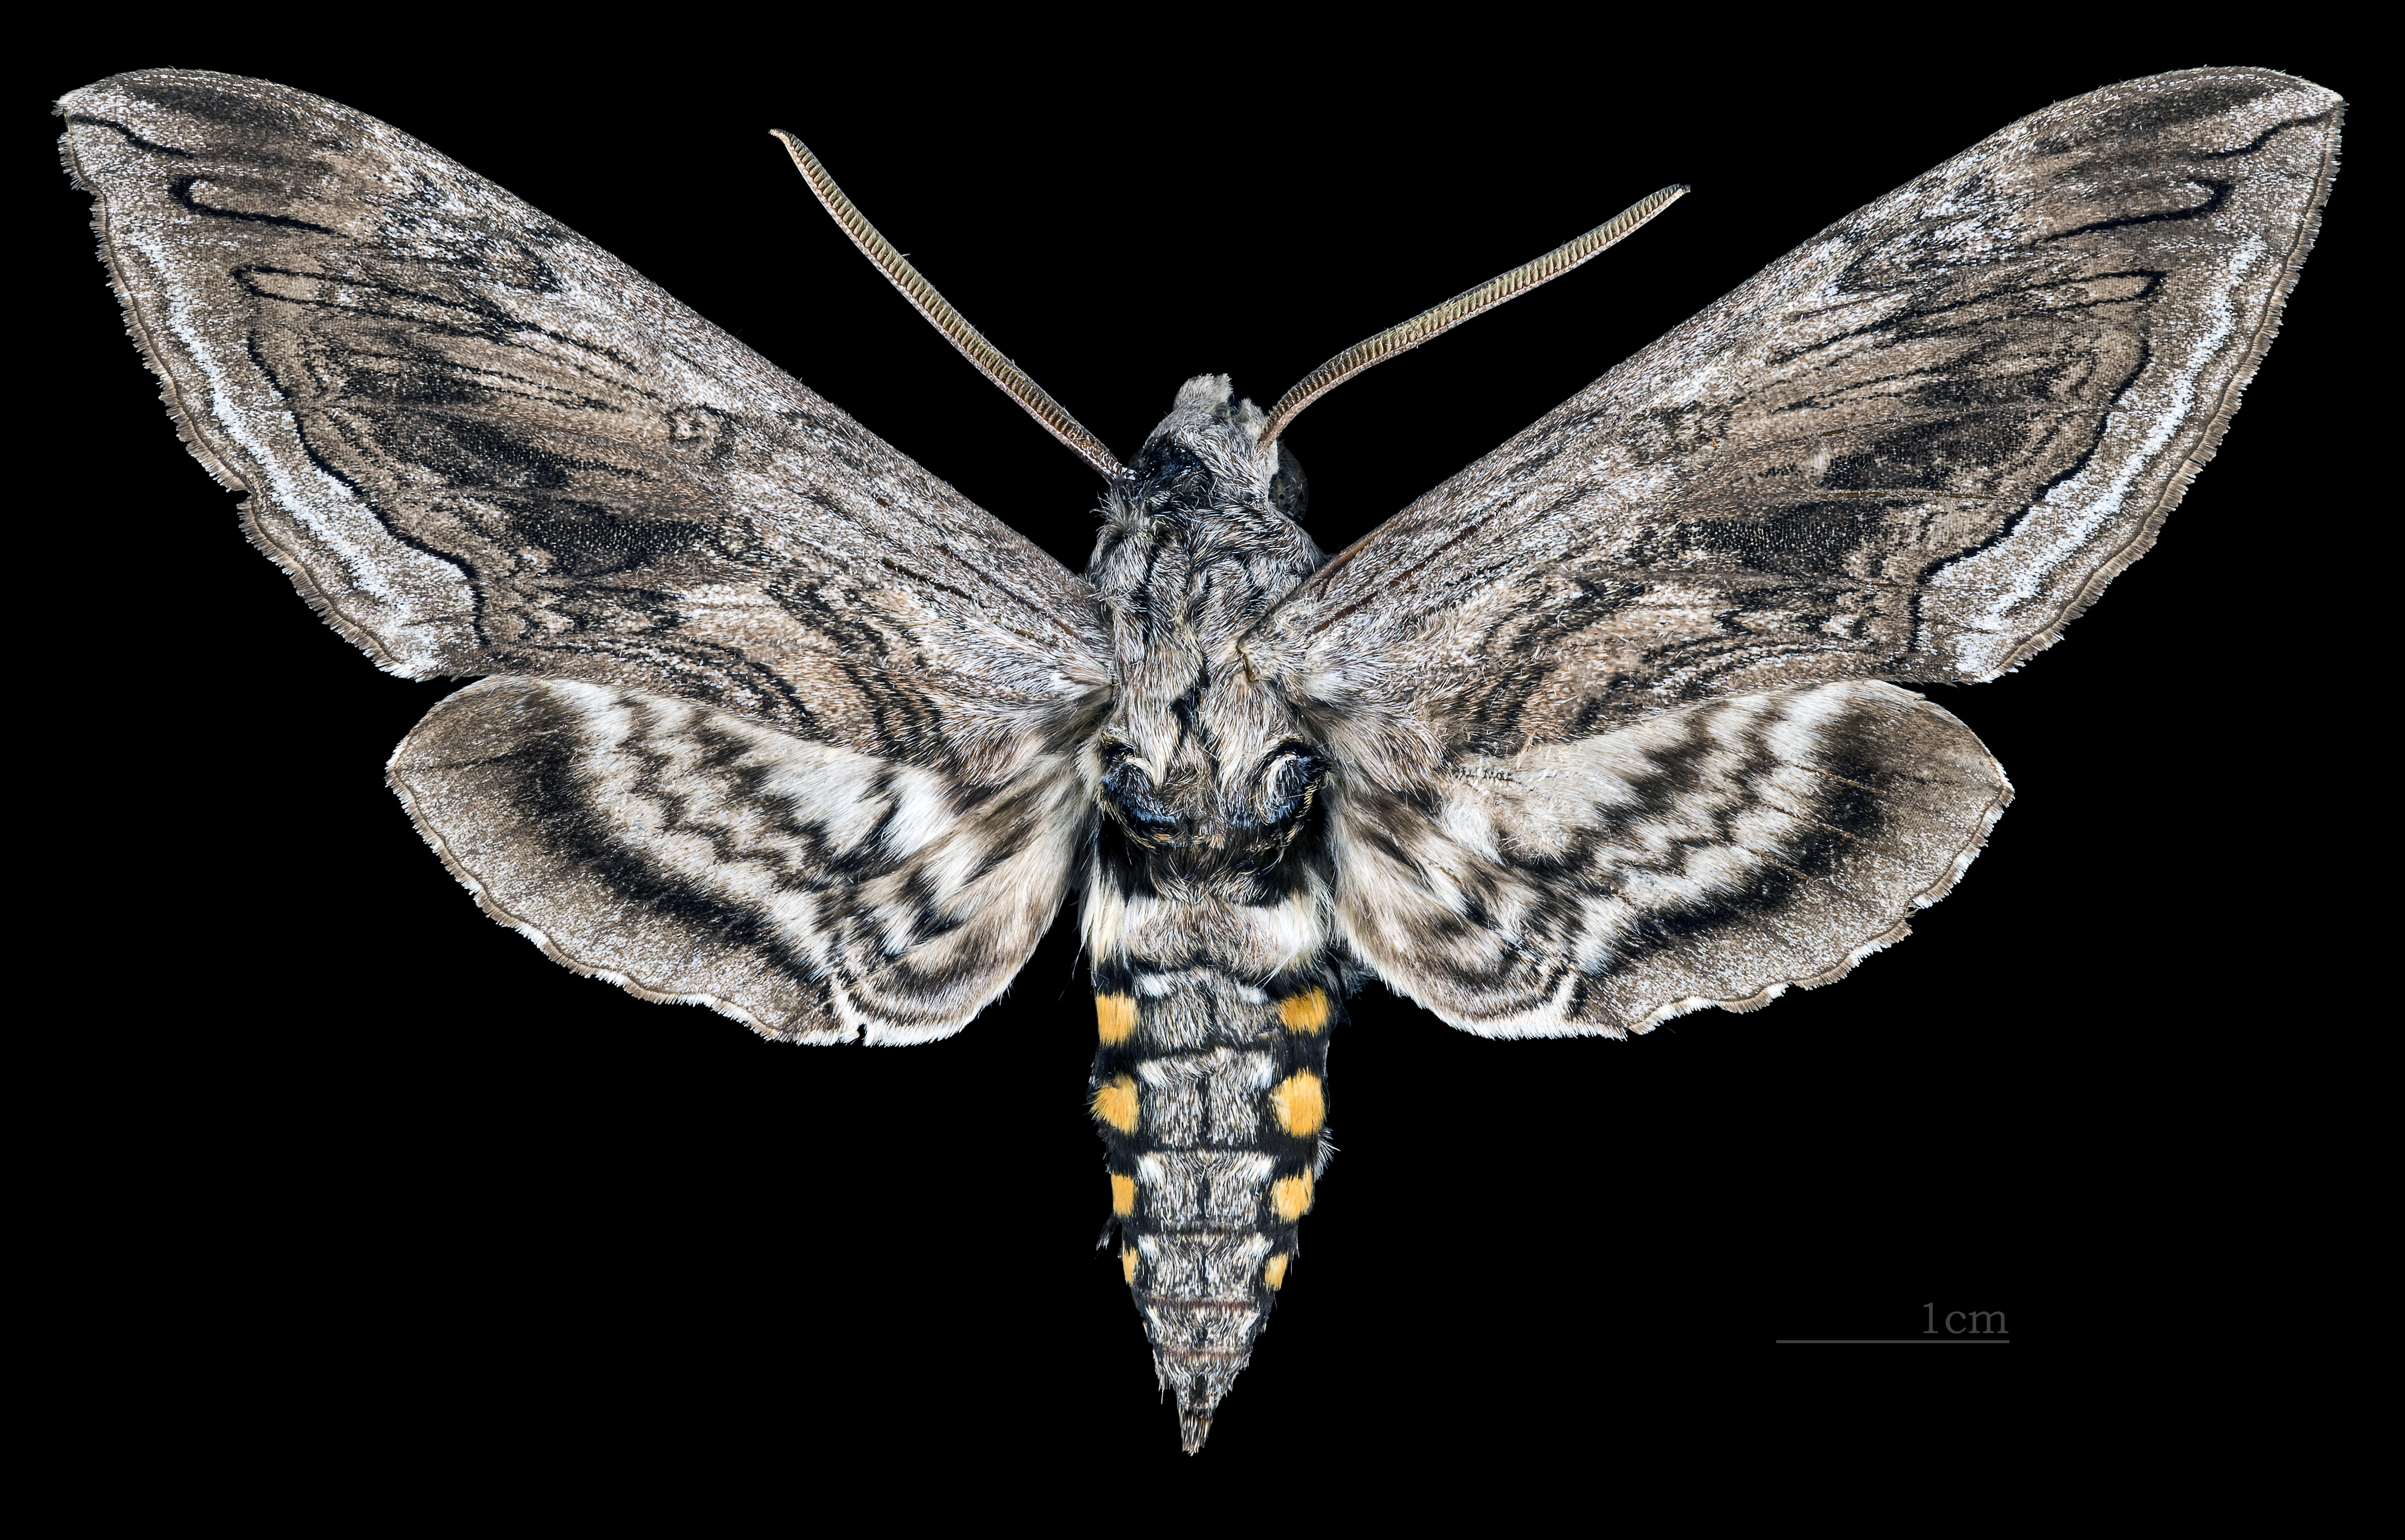 Manduca quinquemaculata - Wikipedia